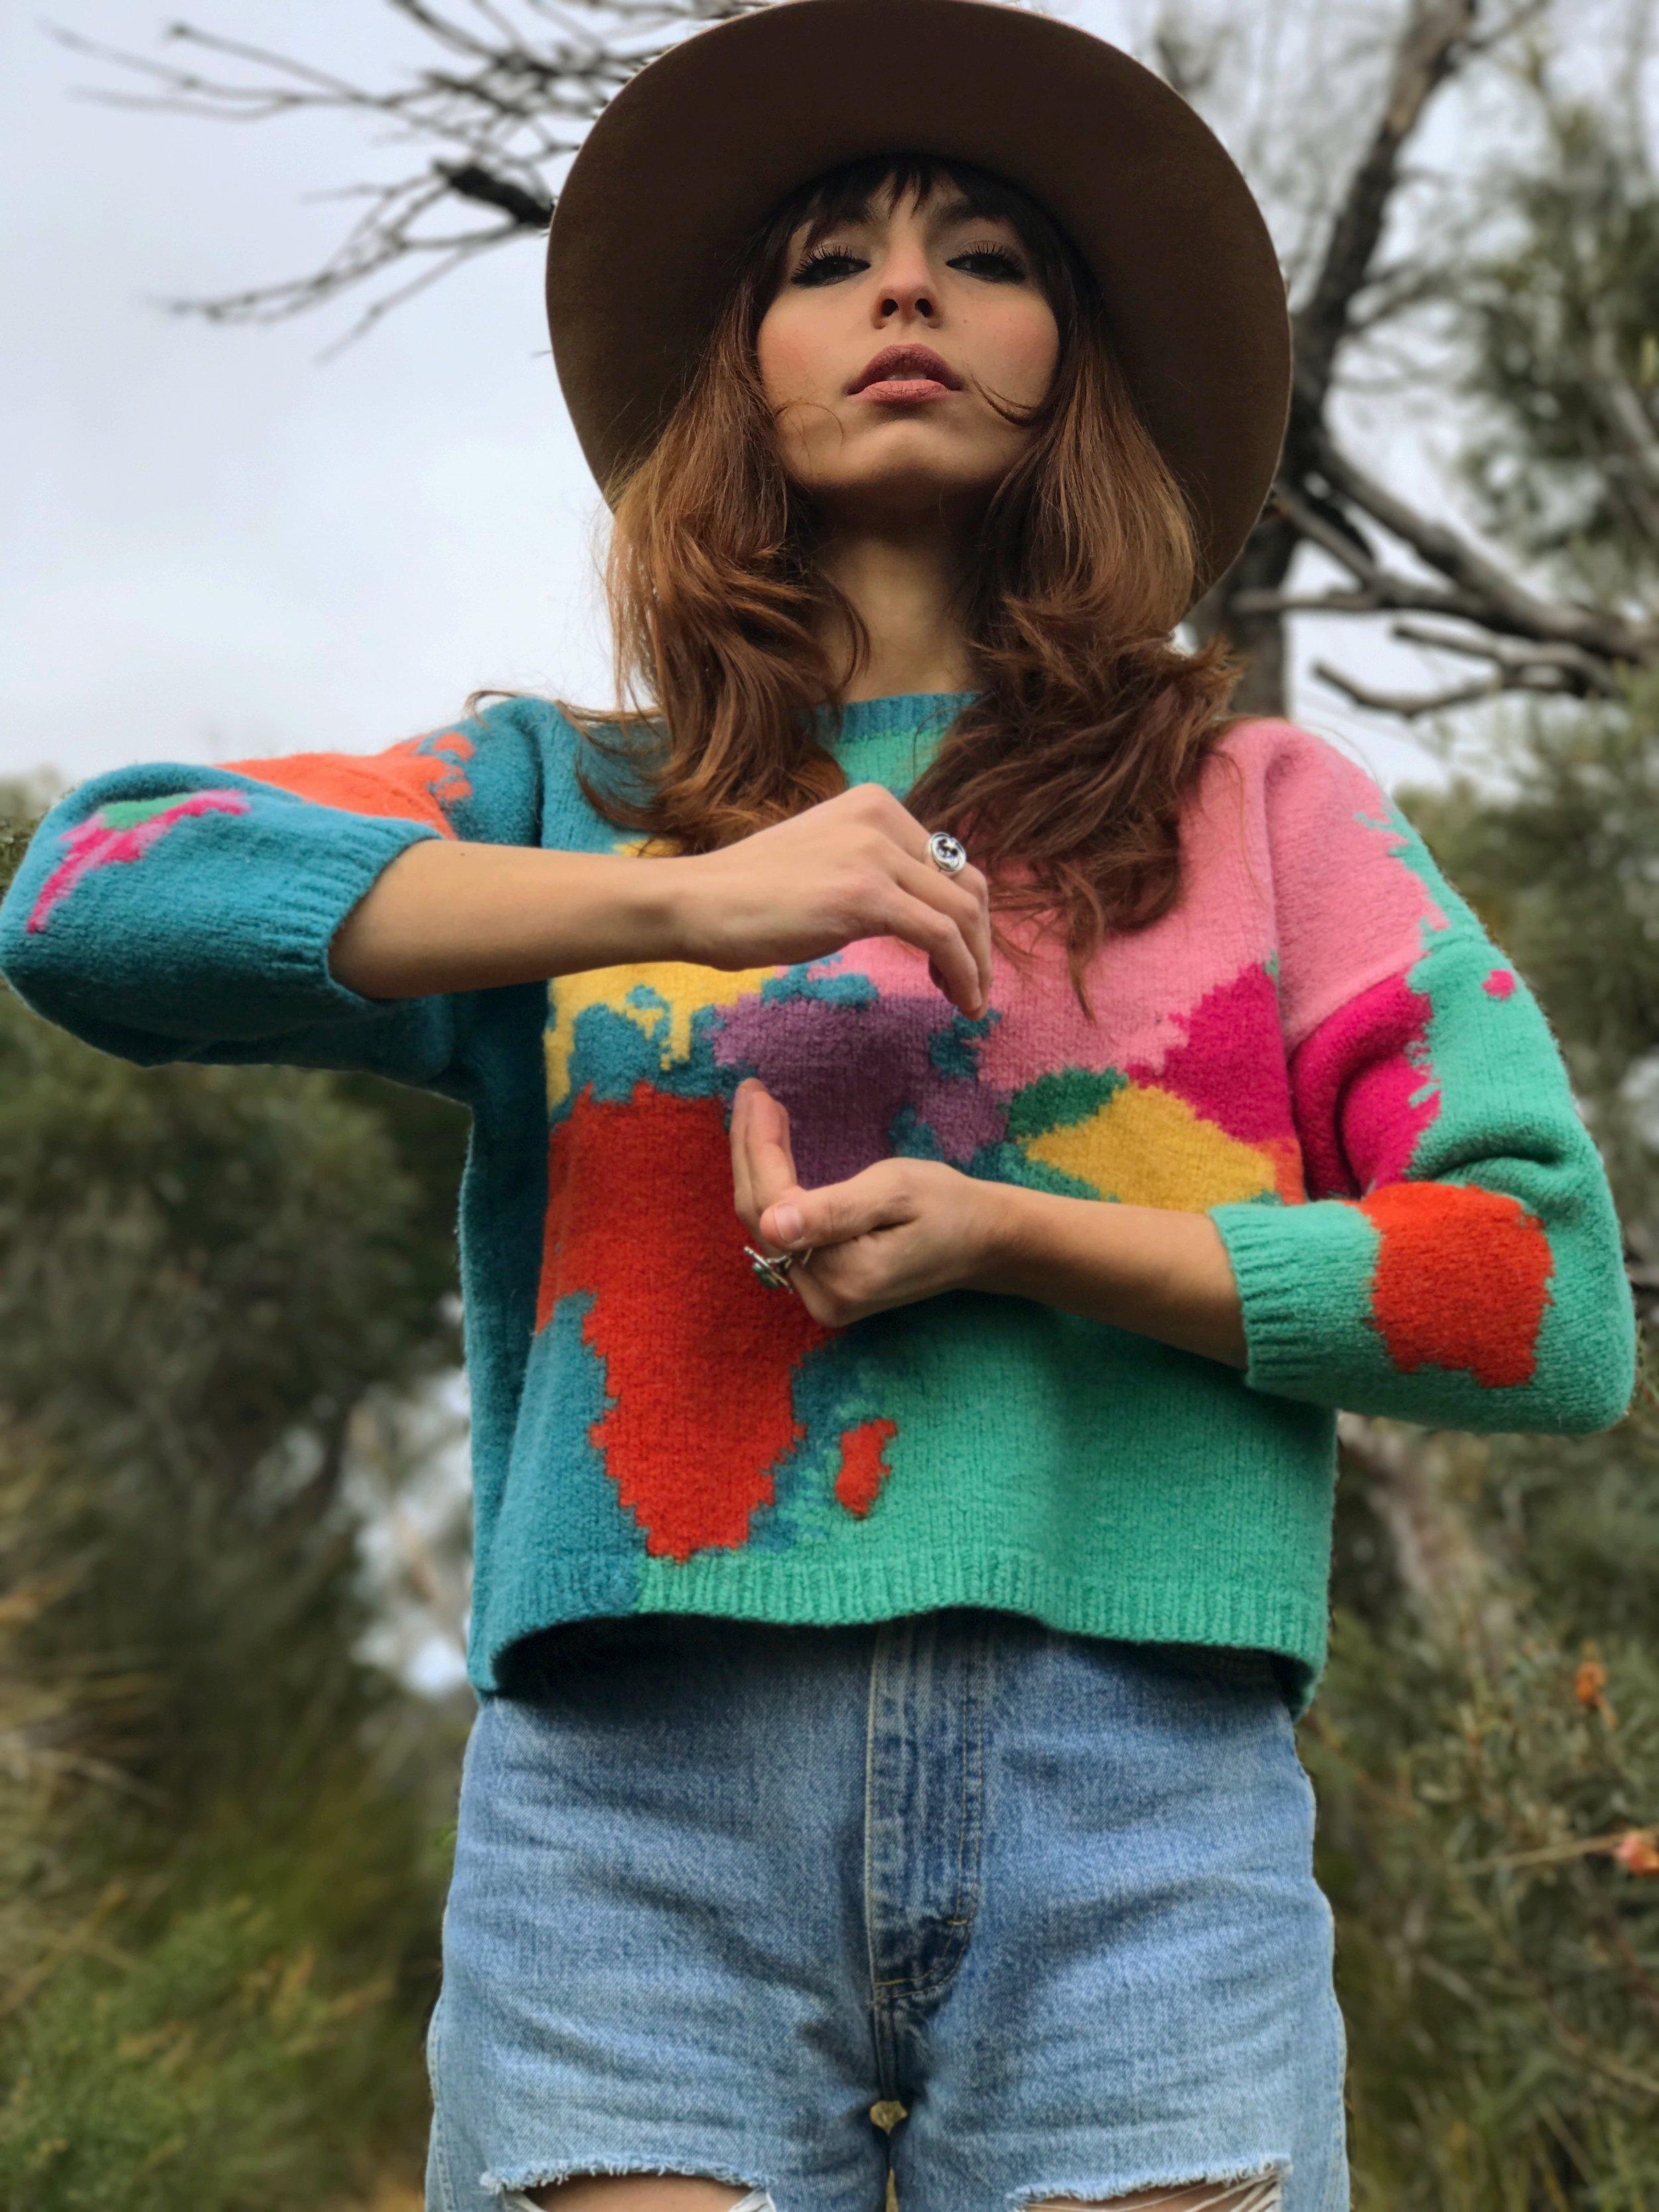 natalie shehata - eco stylist, founder and second hand shopping ambassador